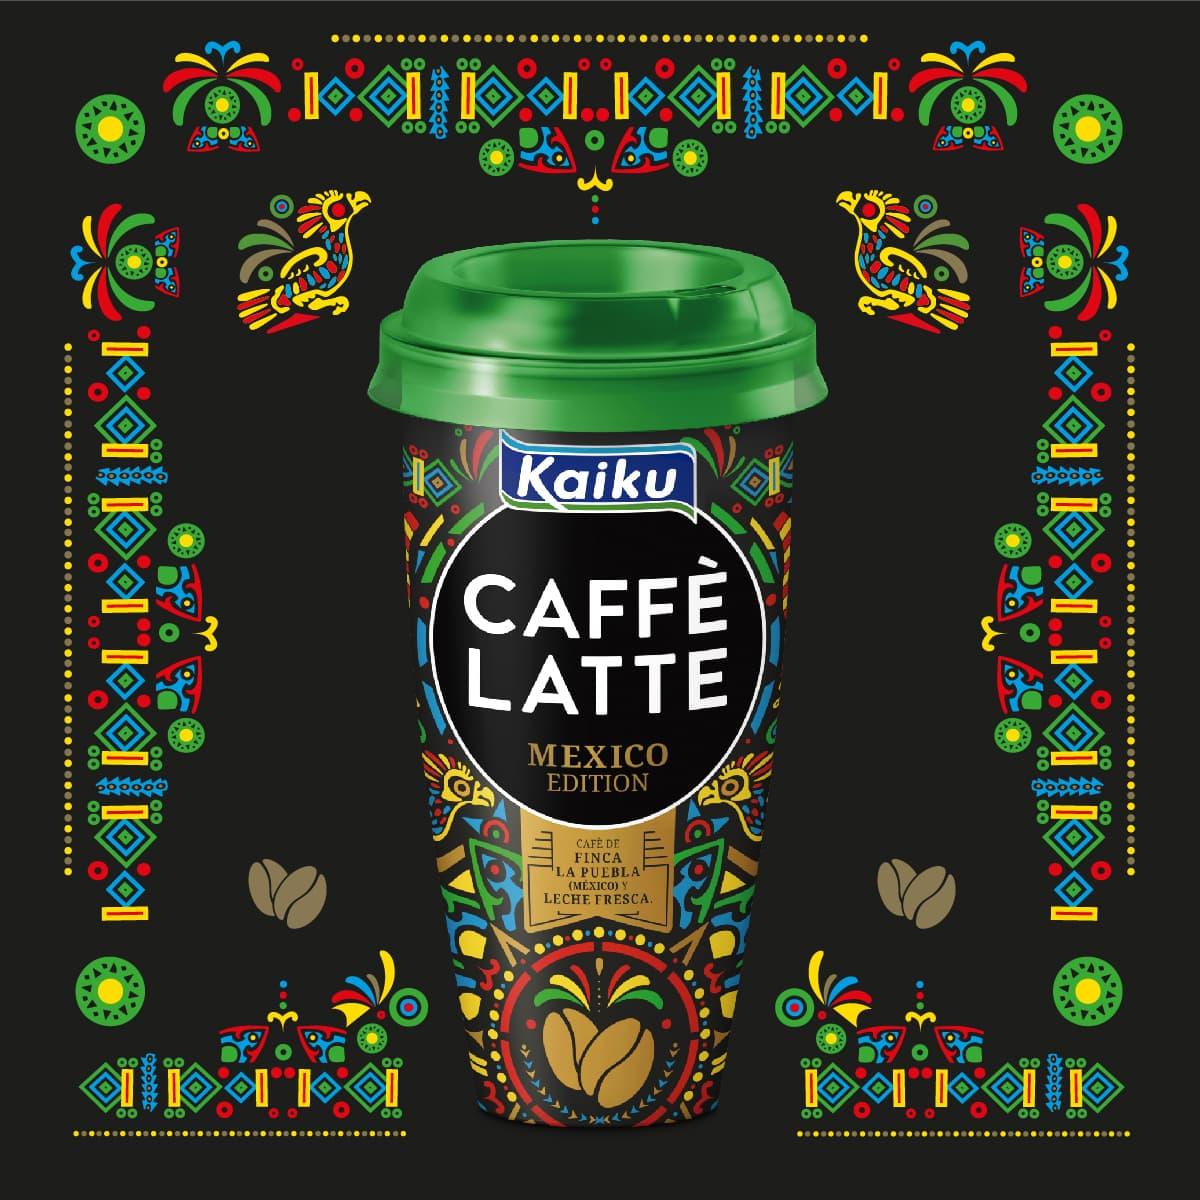 Café mexicano en la familia de Kaiku Caffè Latte :)